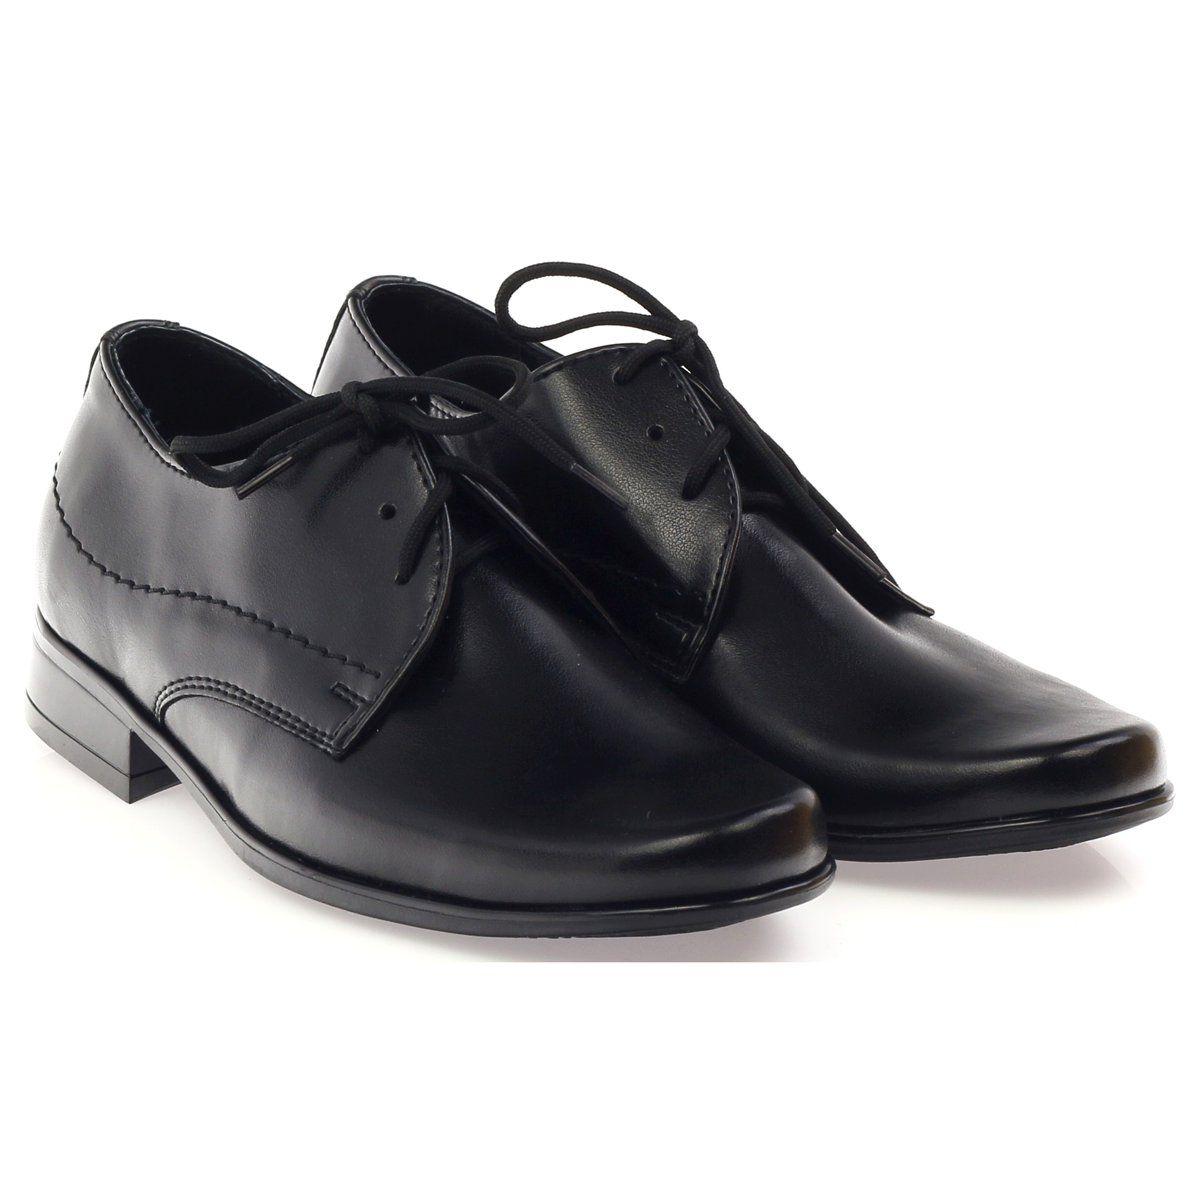 Gregors Pantofle Do Komunii Czarne Communion Shoes Black Slippers Childrens Shoes